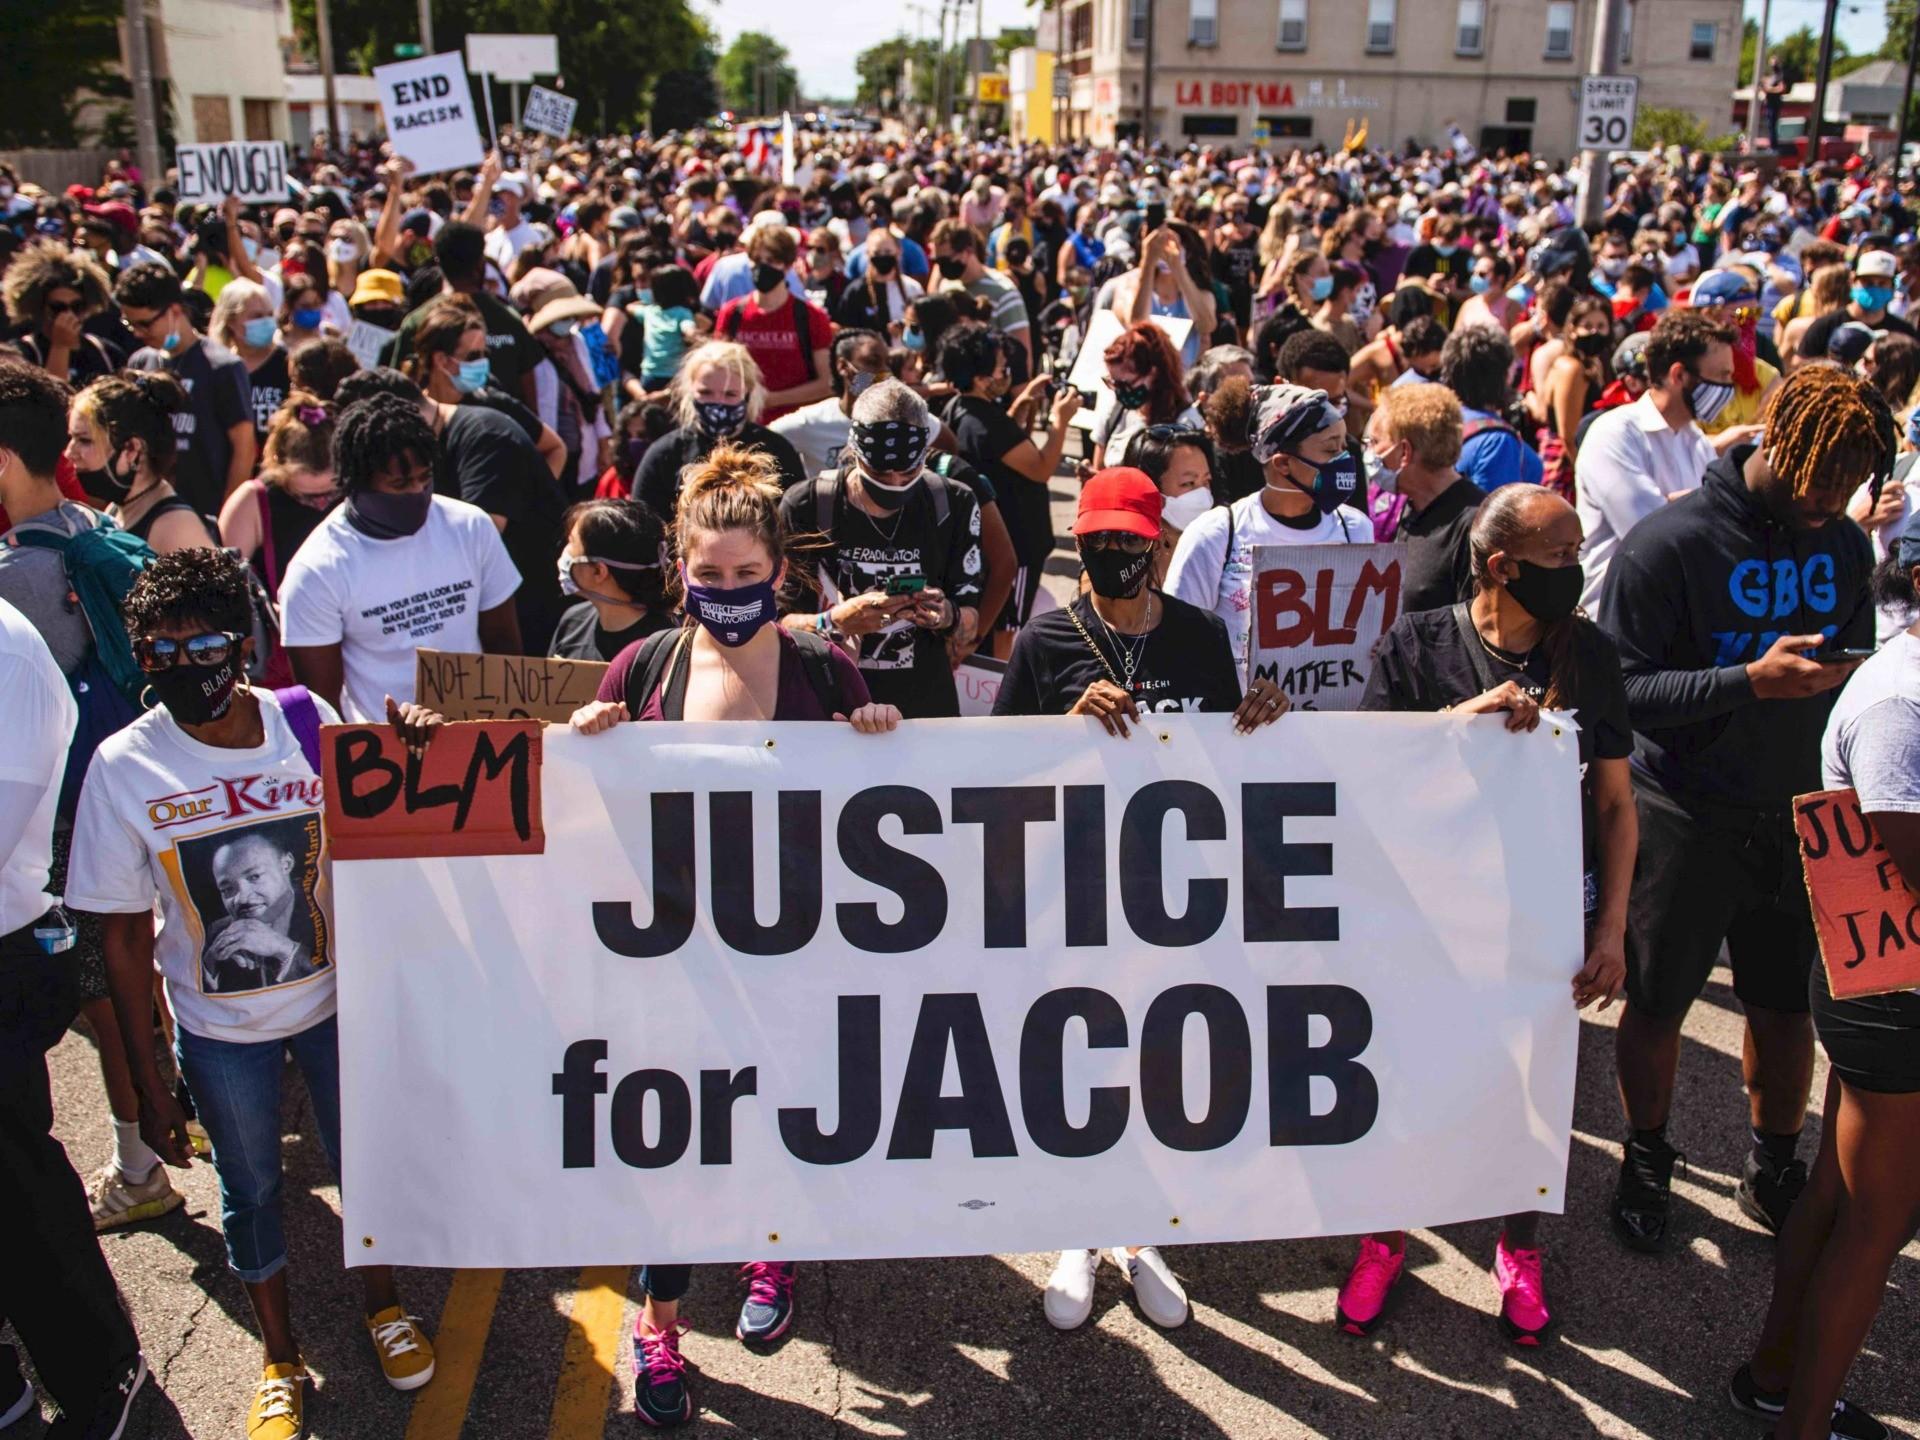 Justice for Jacob rally Kenosha (Stephen Maturen / AFP / Getty)